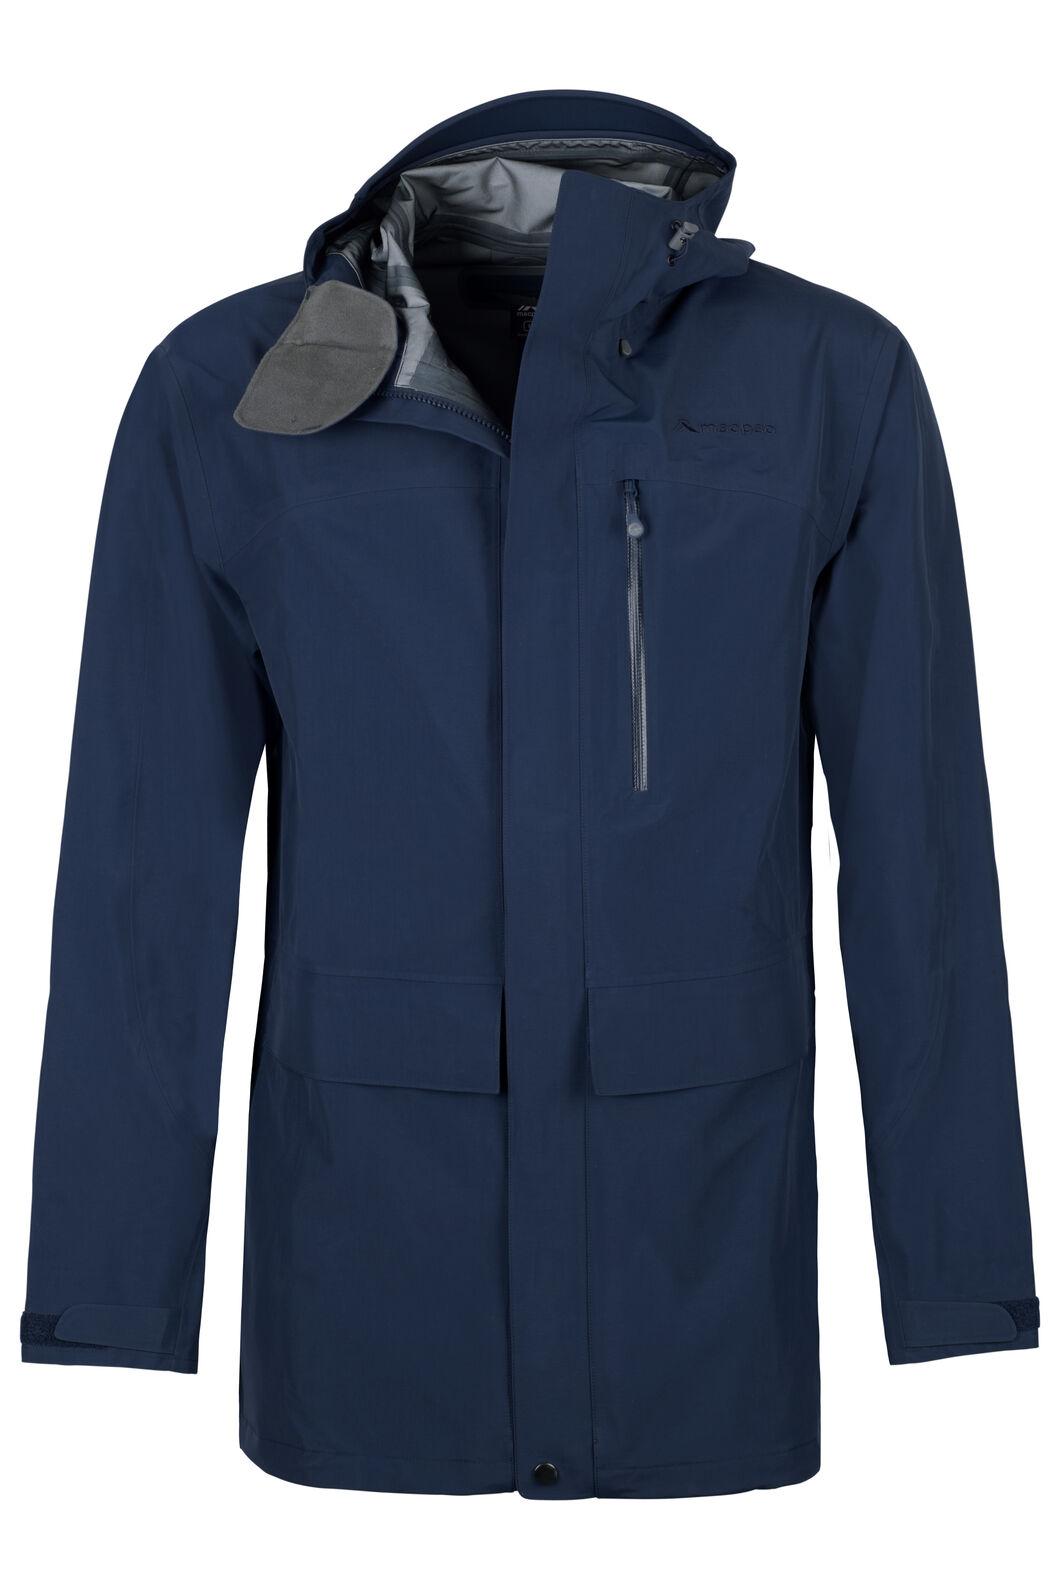 Macpac Resolution Pertex® Long Rain Jacket - Men's, Black Iris, hi-res